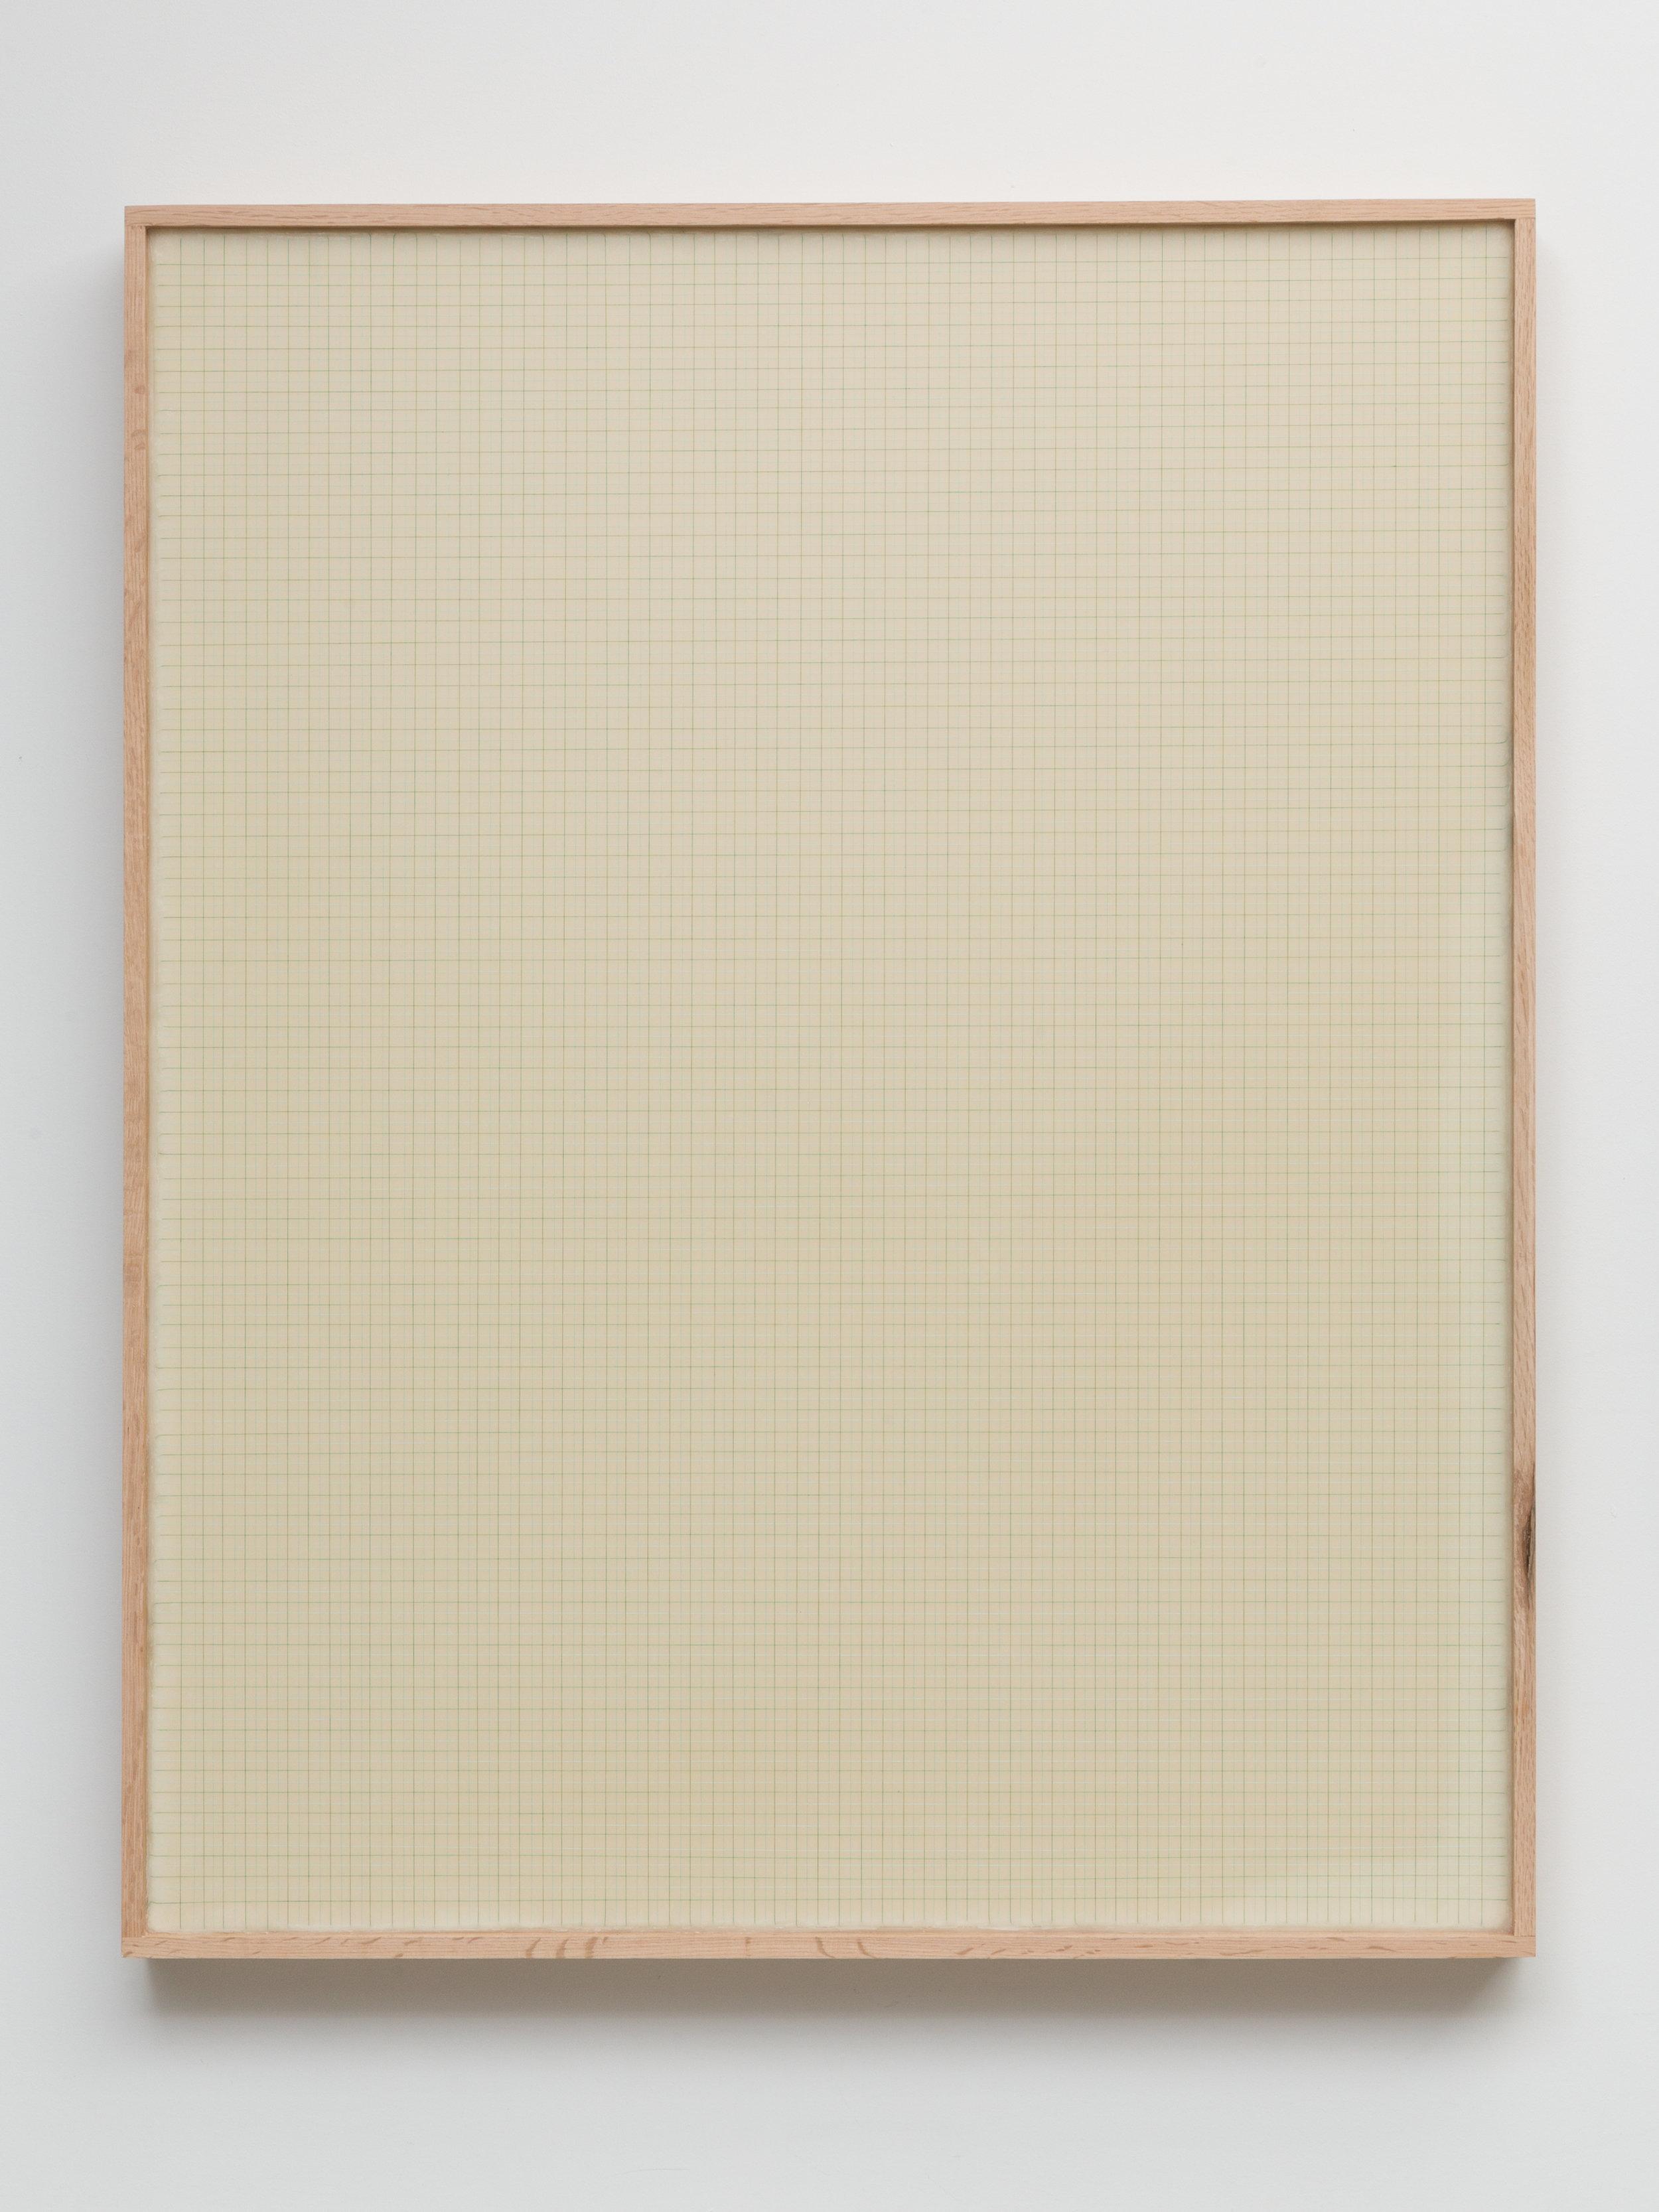 Nicole Patel Wax Grid 001.jpg